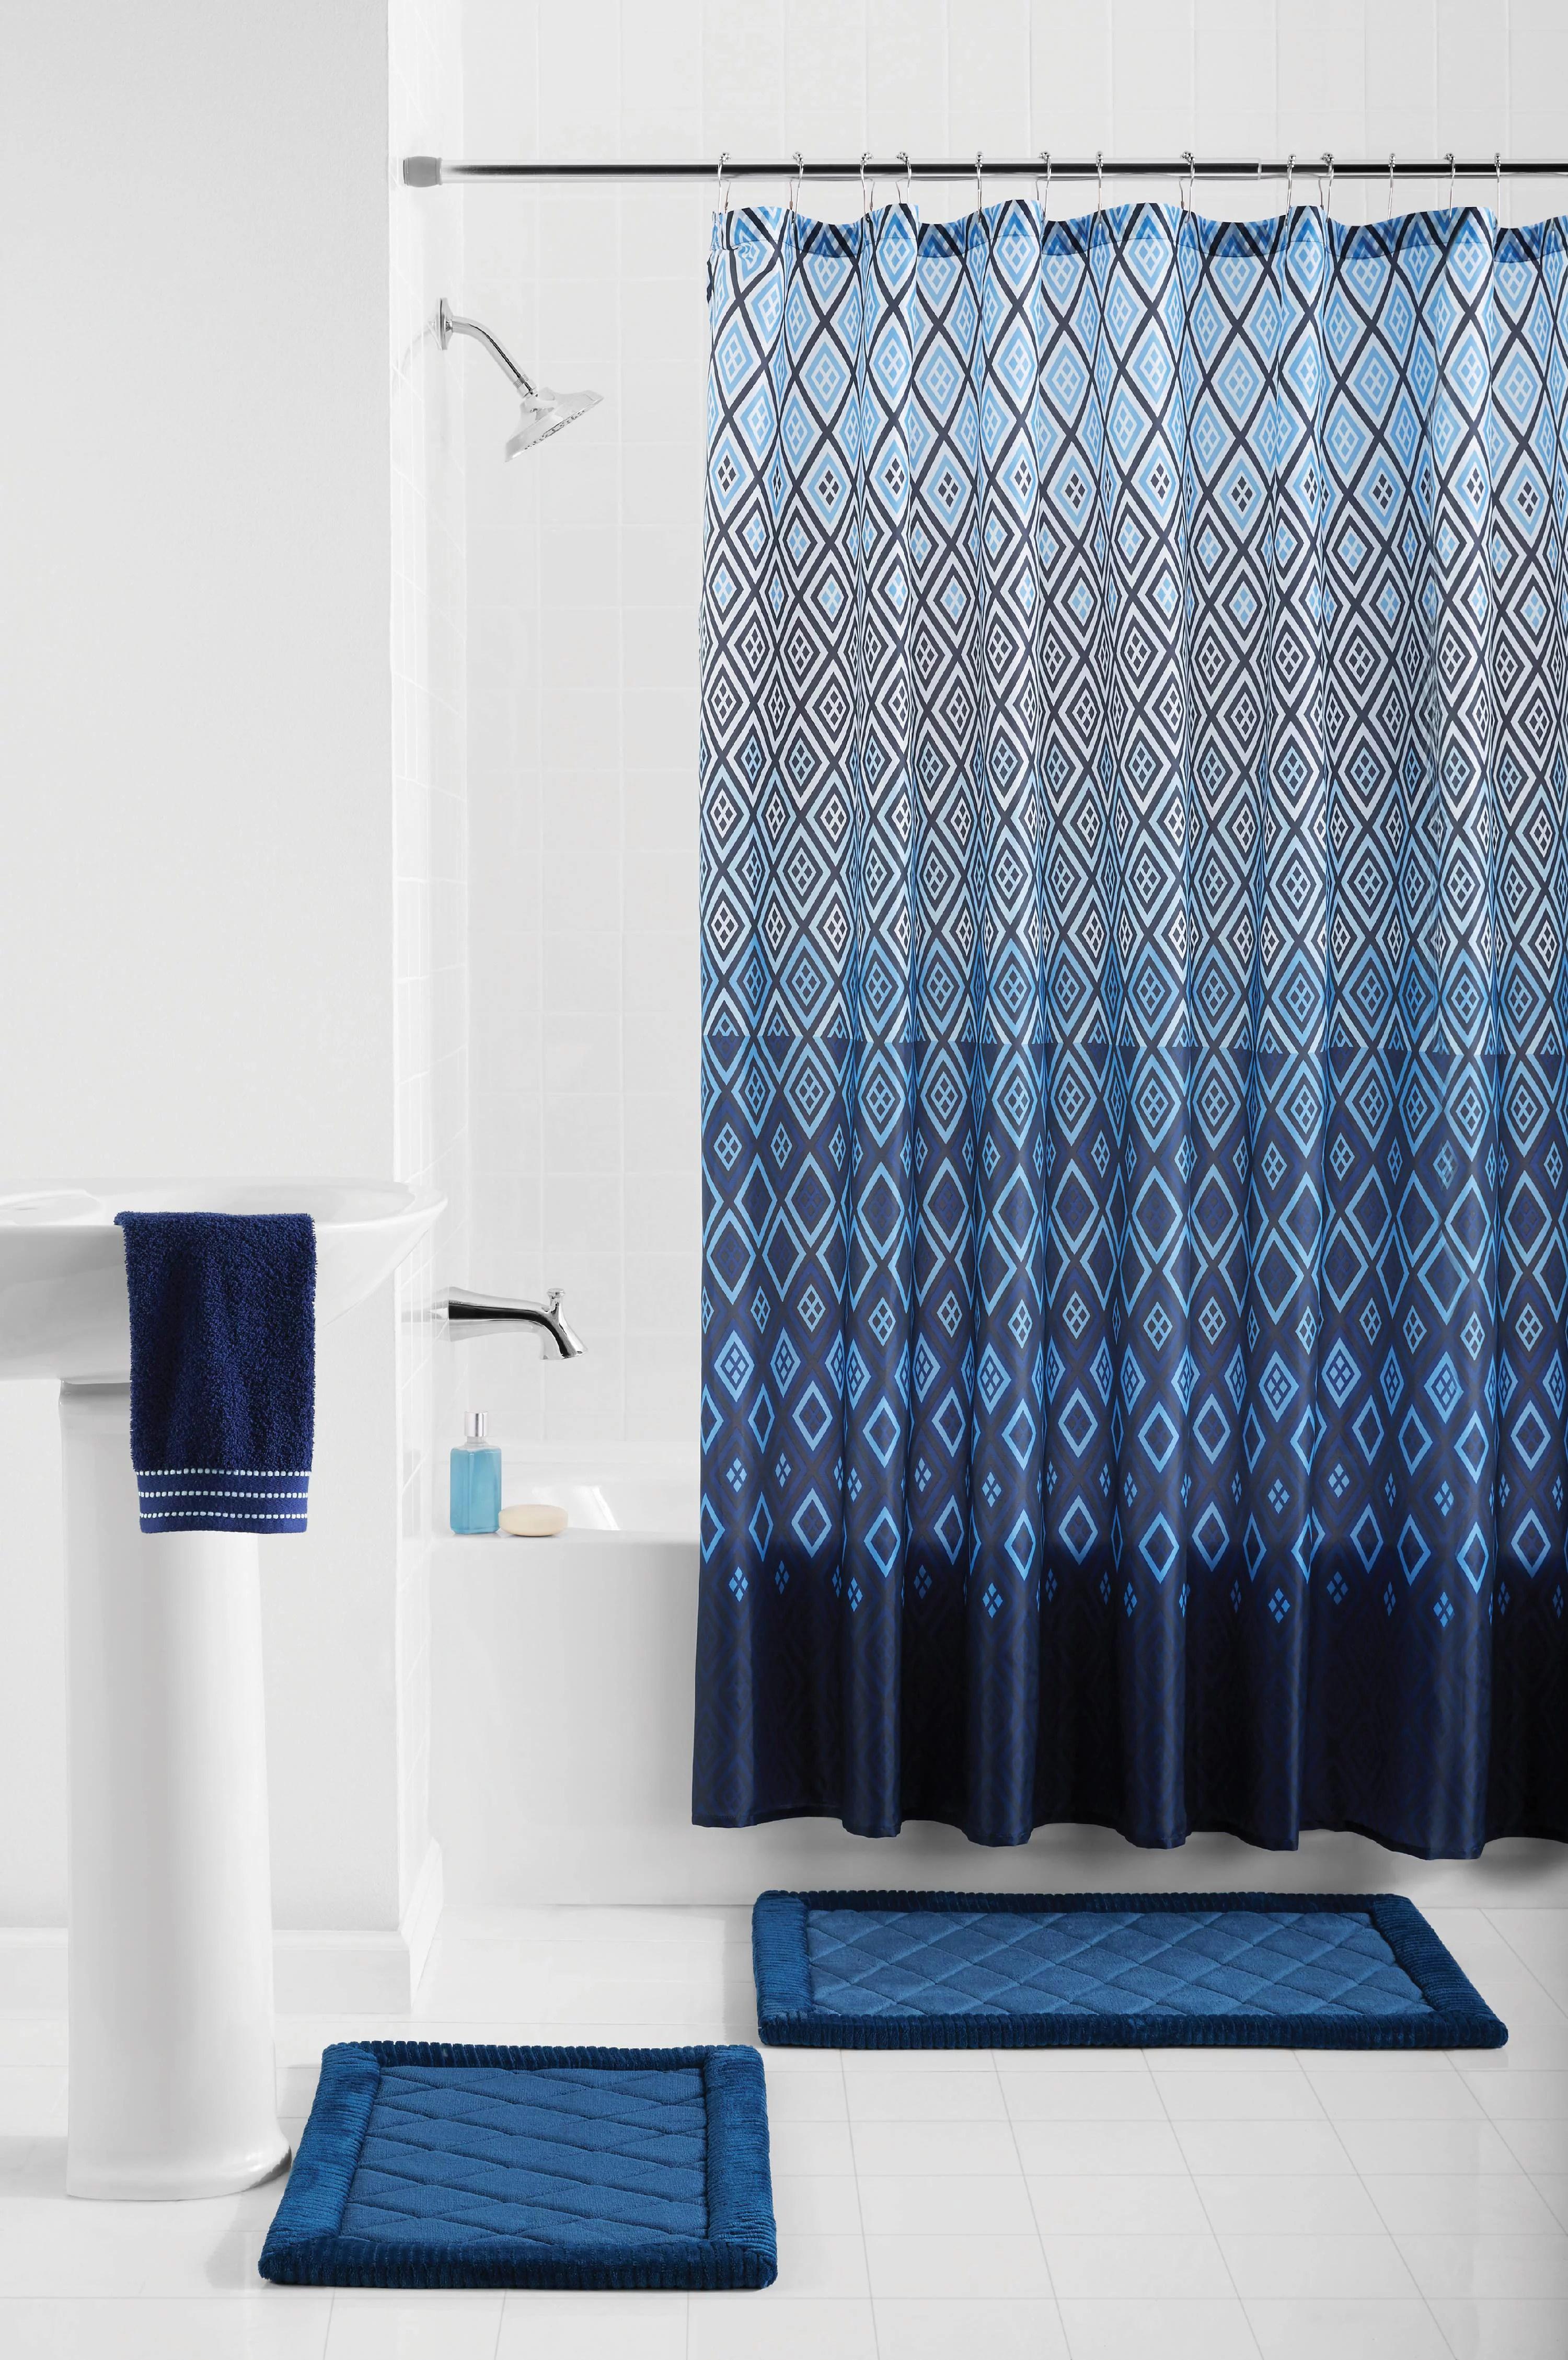 mainstays stockholm geometric polyester shower curtain bath set blue 15 pieces walmart com